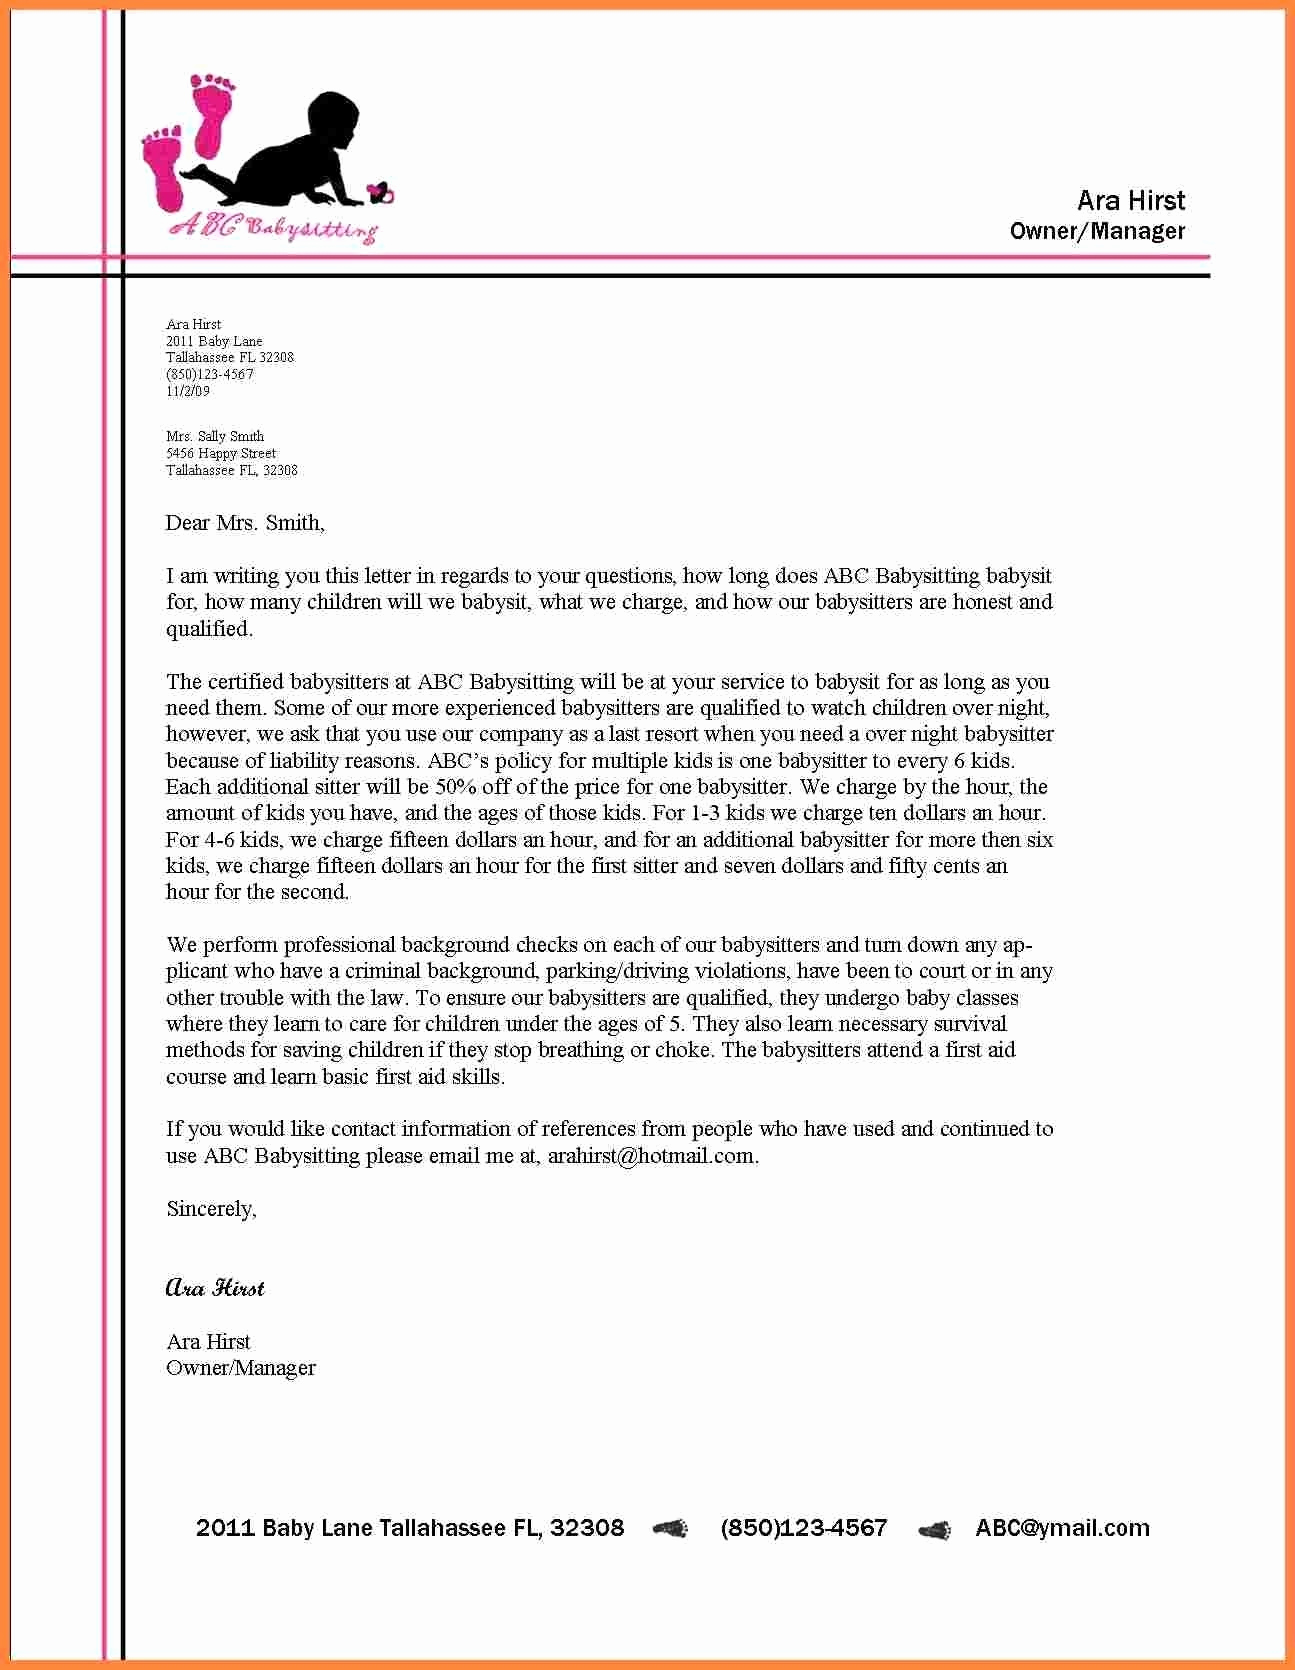 Sample Of Business Letterhead Inspirational formal Letter format with Letterhead 2018